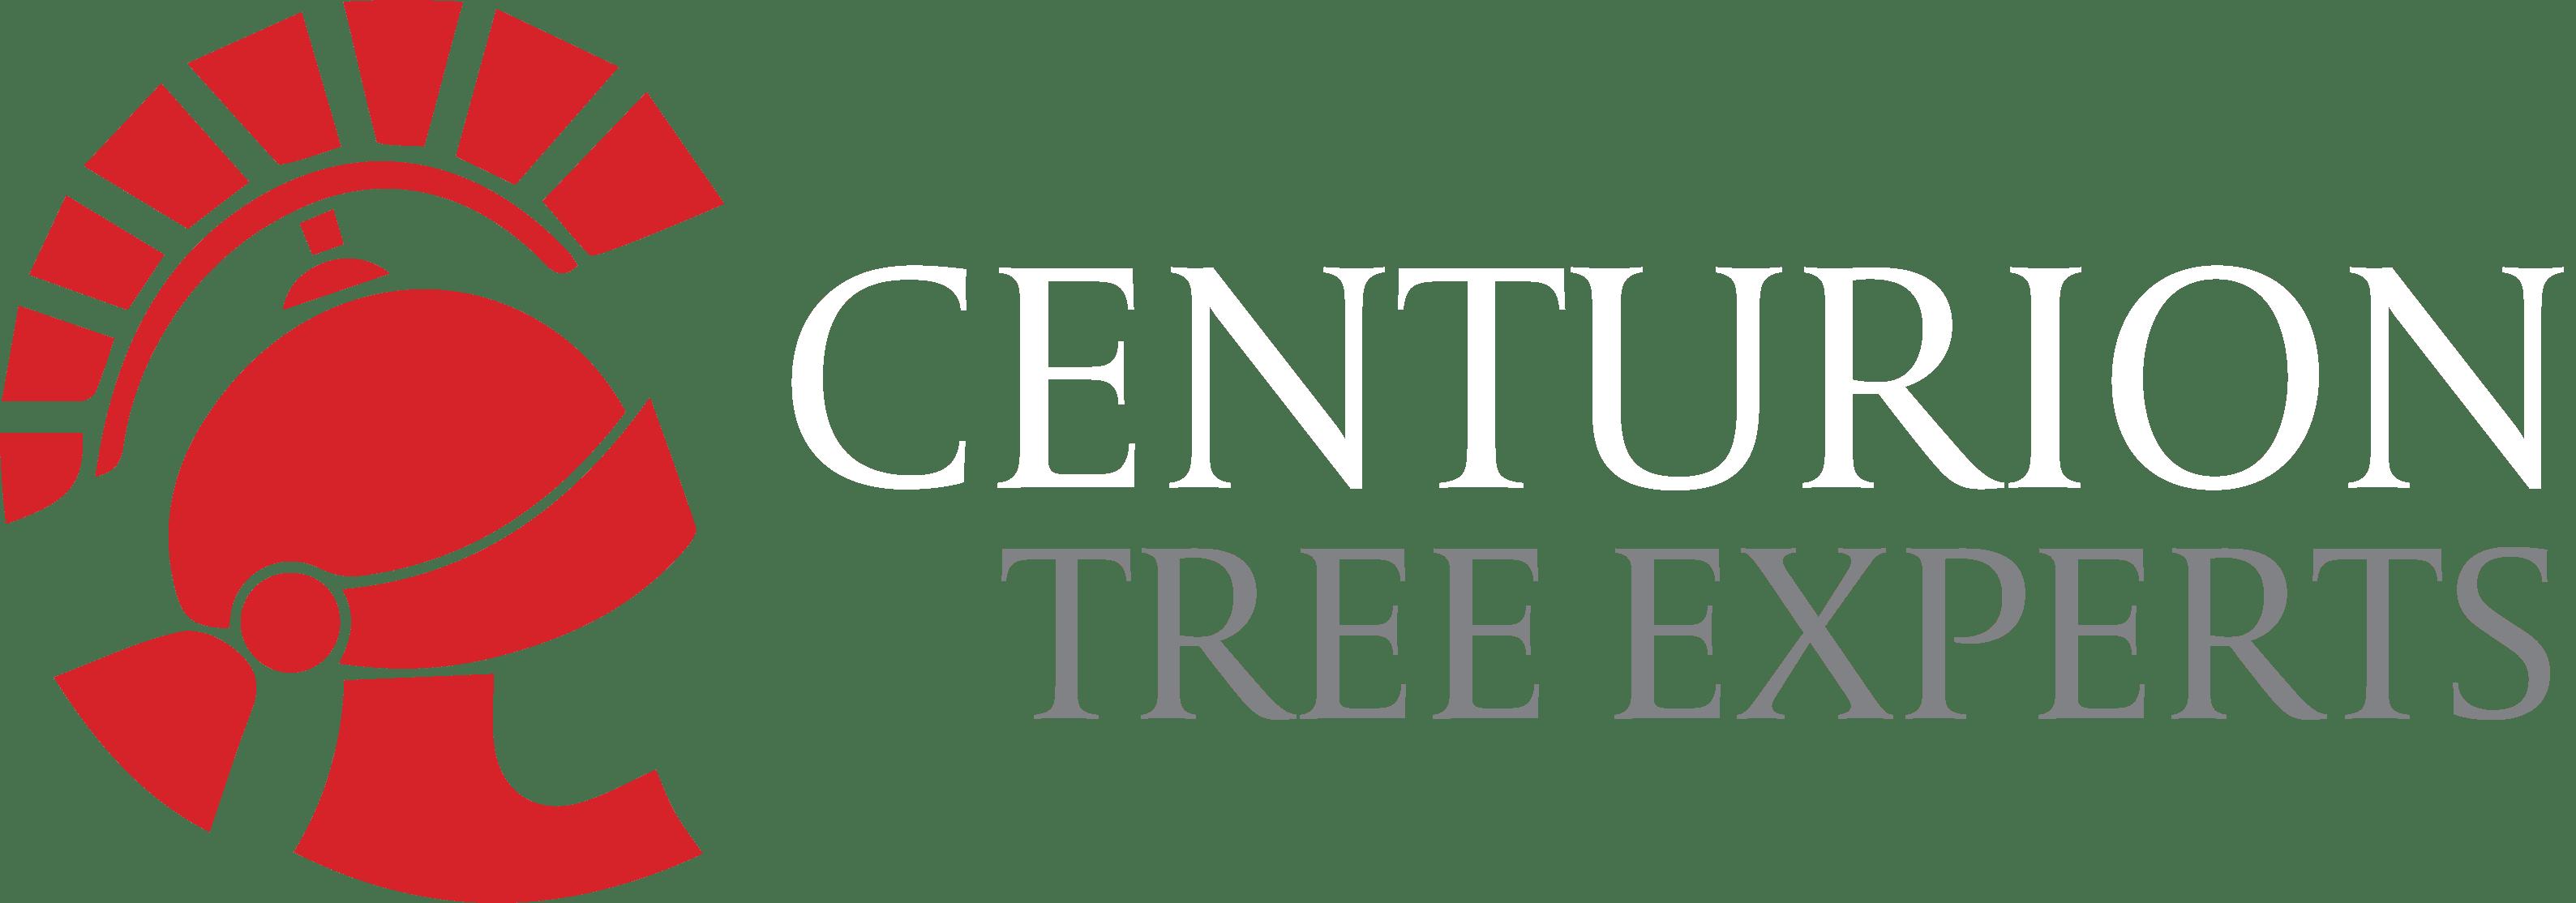 Centurion tree service logo - transparent